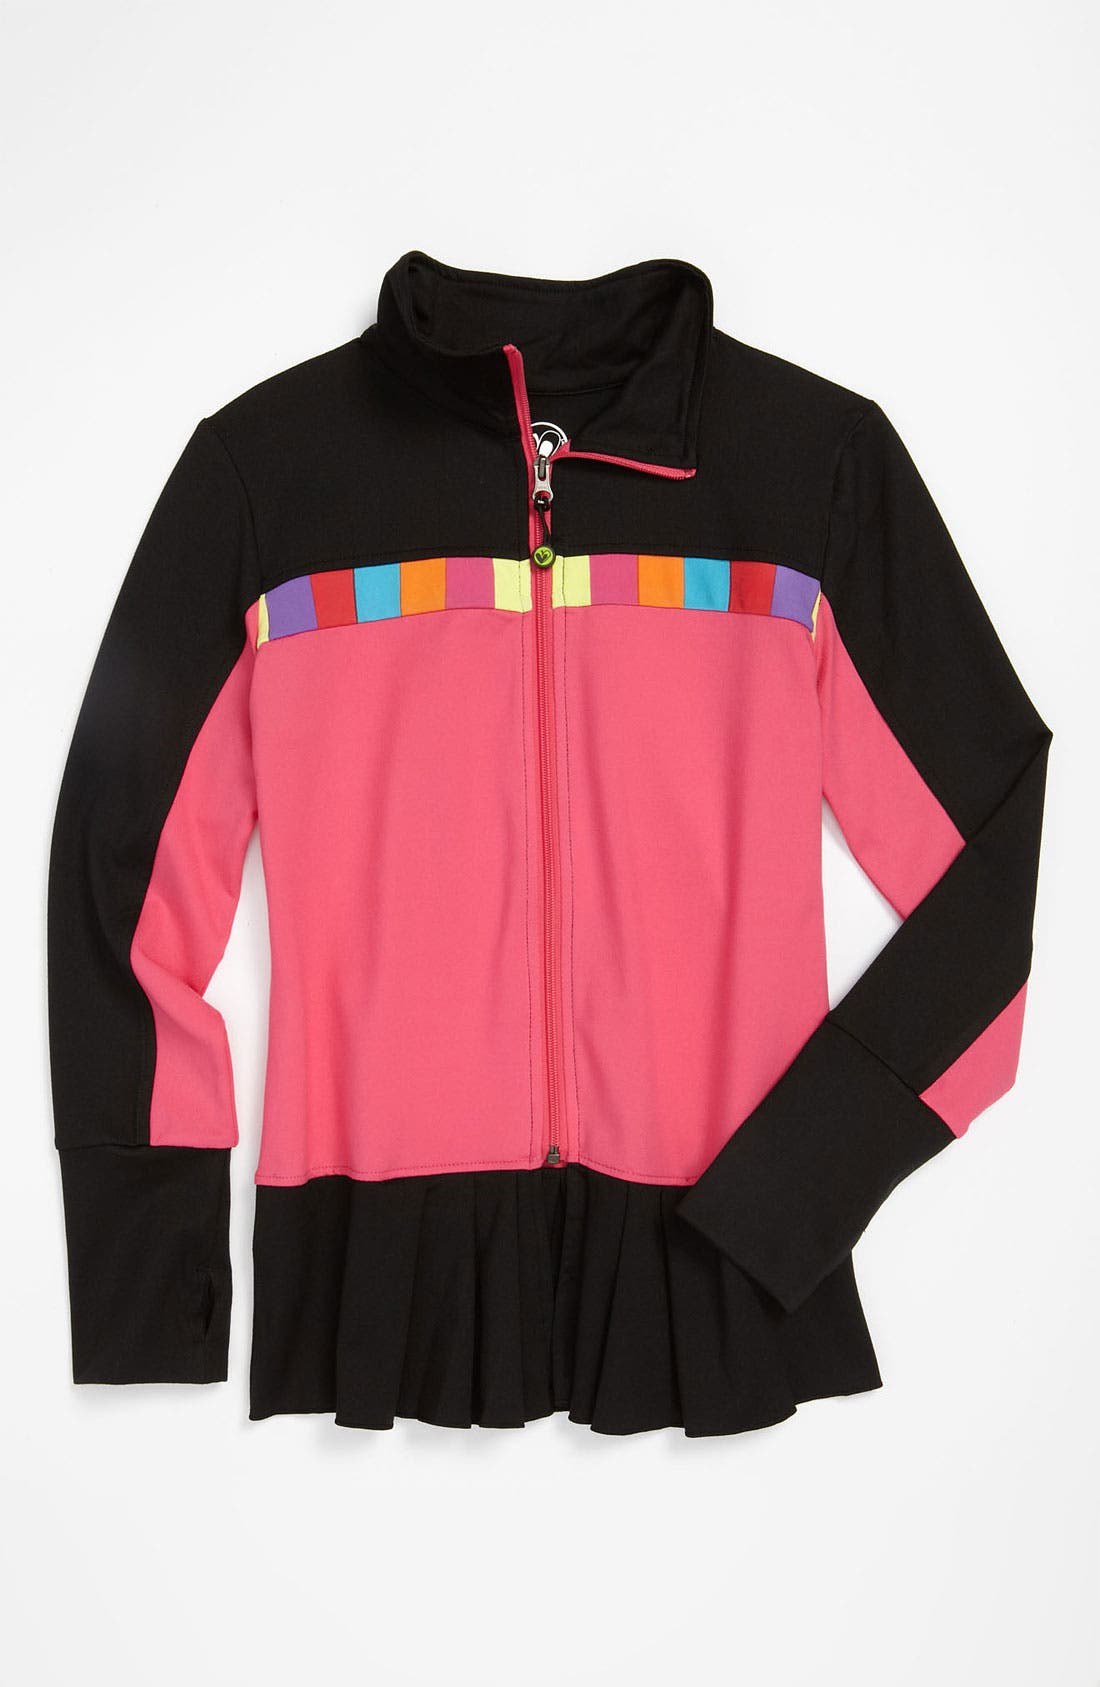 Alternate Image 1 Selected - Limeapple Pleated Jacket (Big Girls)